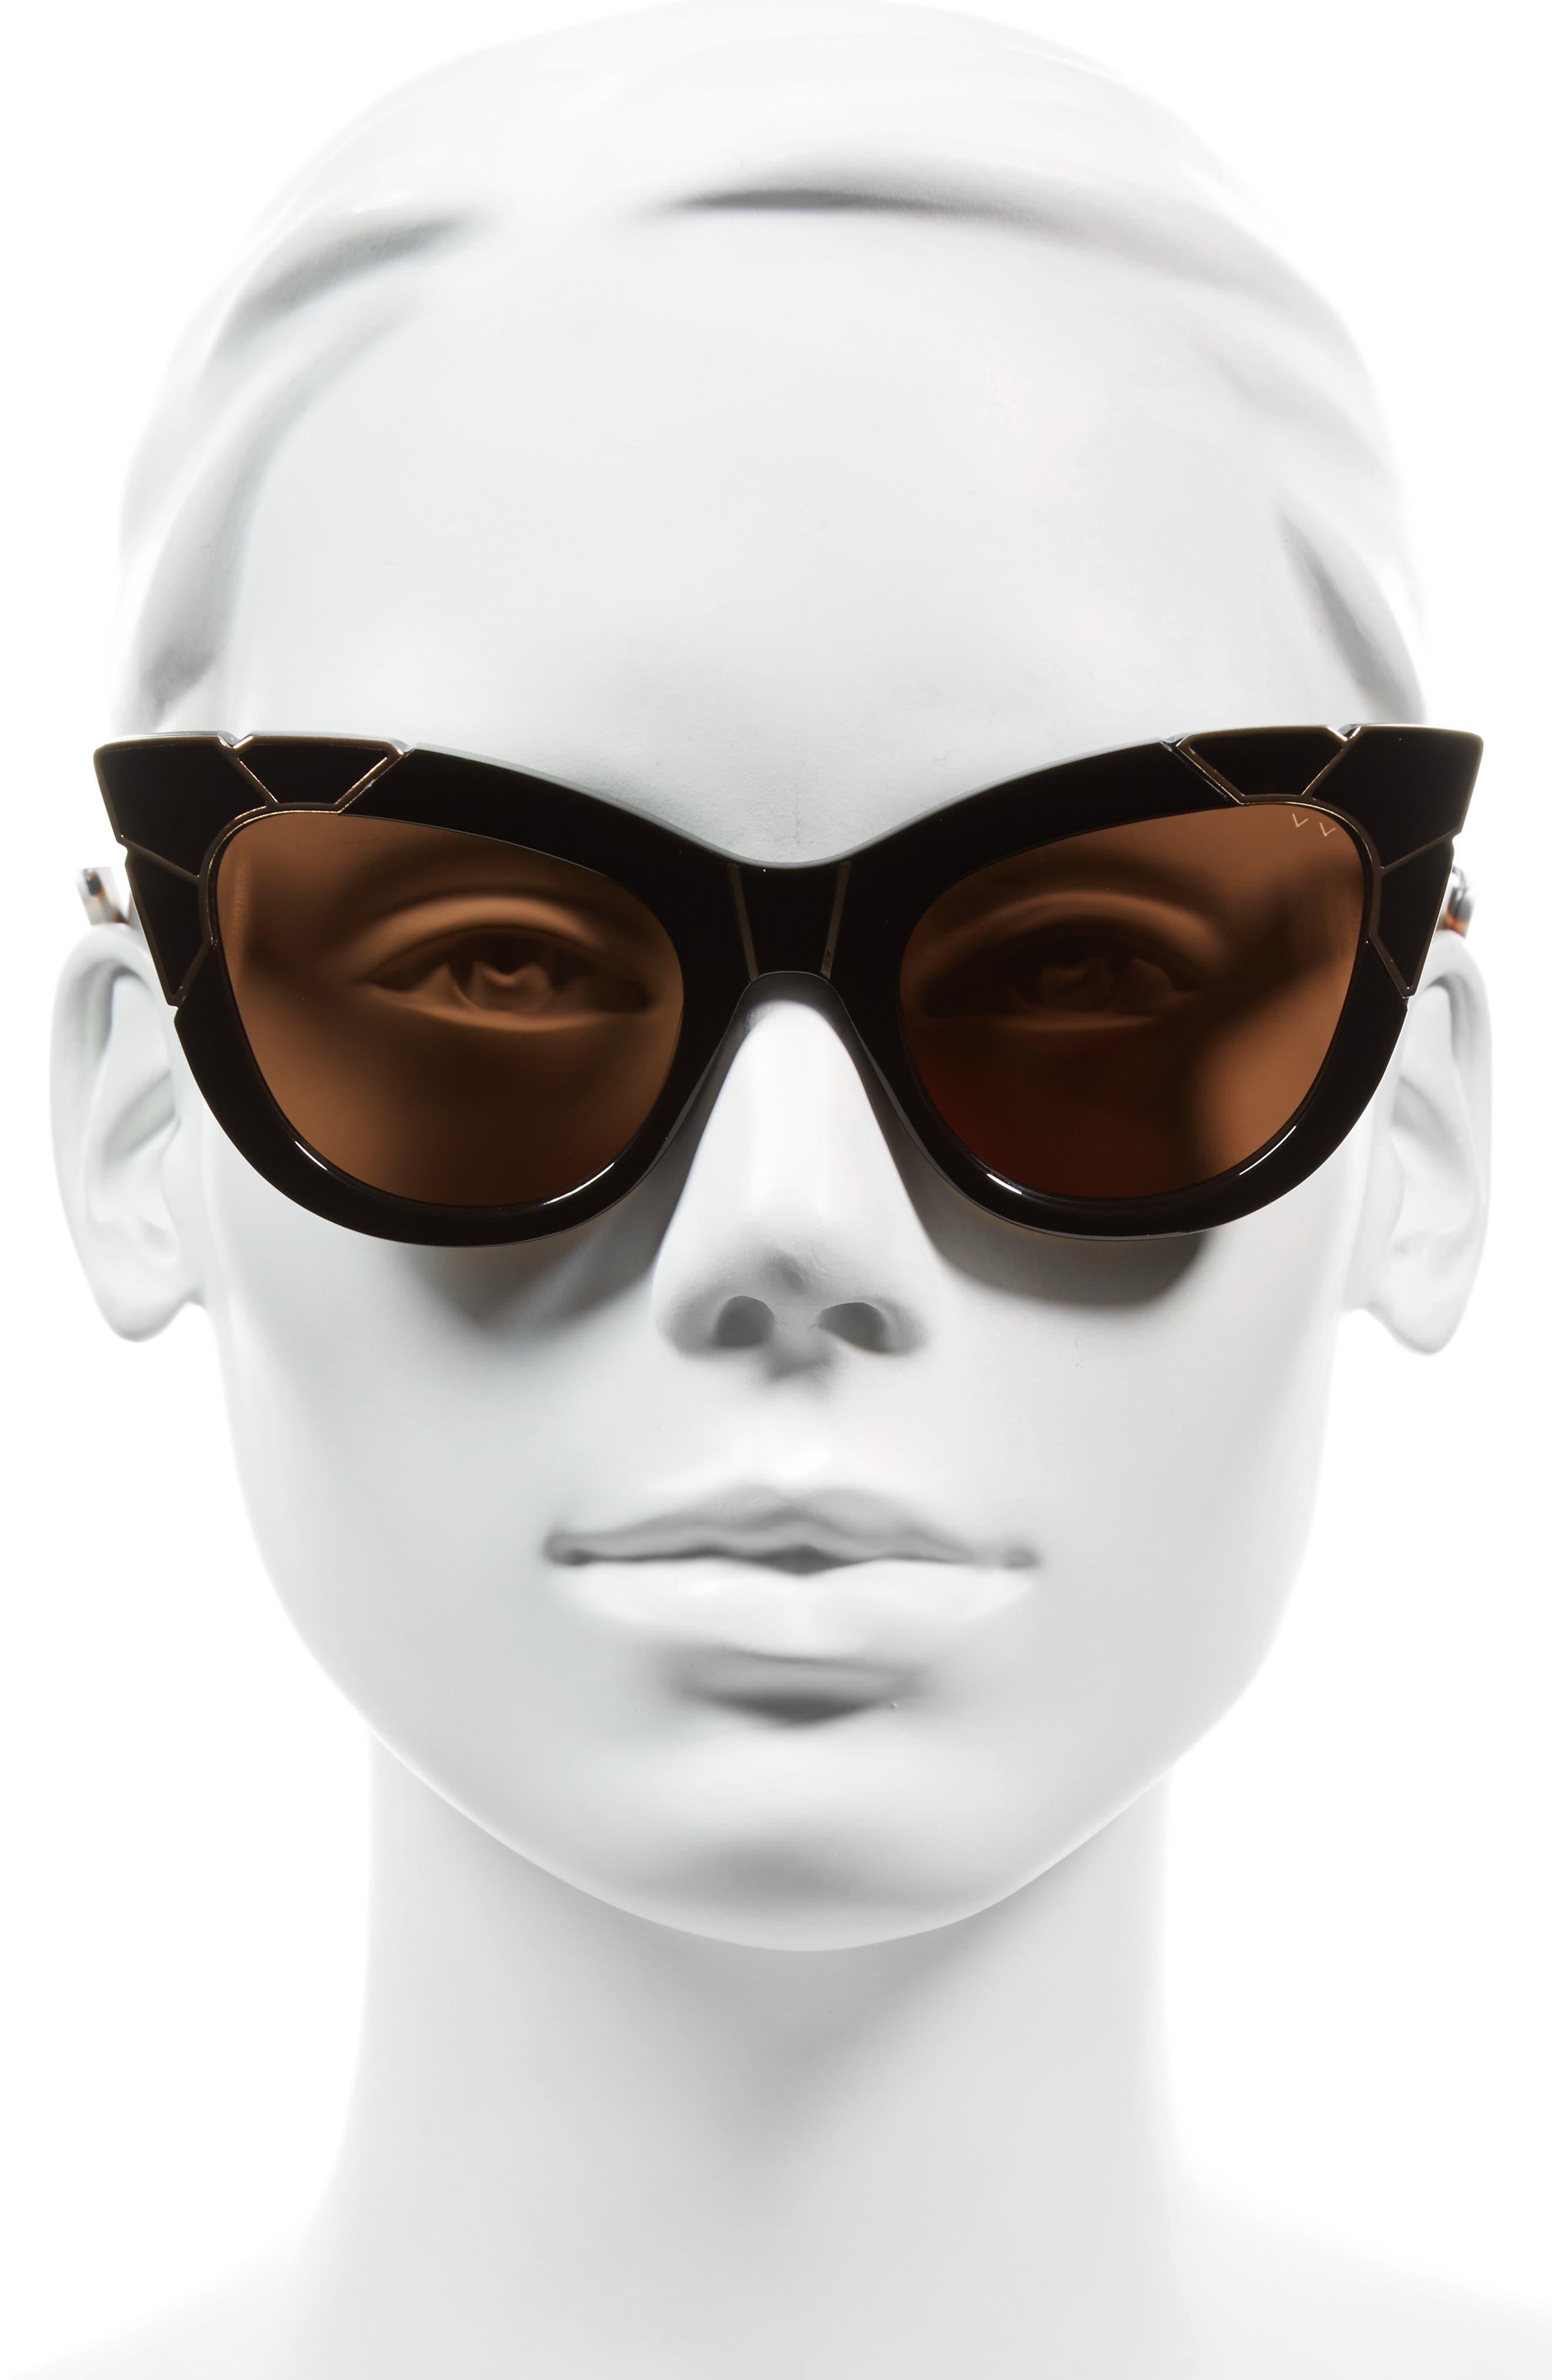 Puss & Boots 49mm Cat Eye Sunglasses,                             Alternate thumbnail 2, color,                             BLACK/ GOLD/ BLACK BROWN